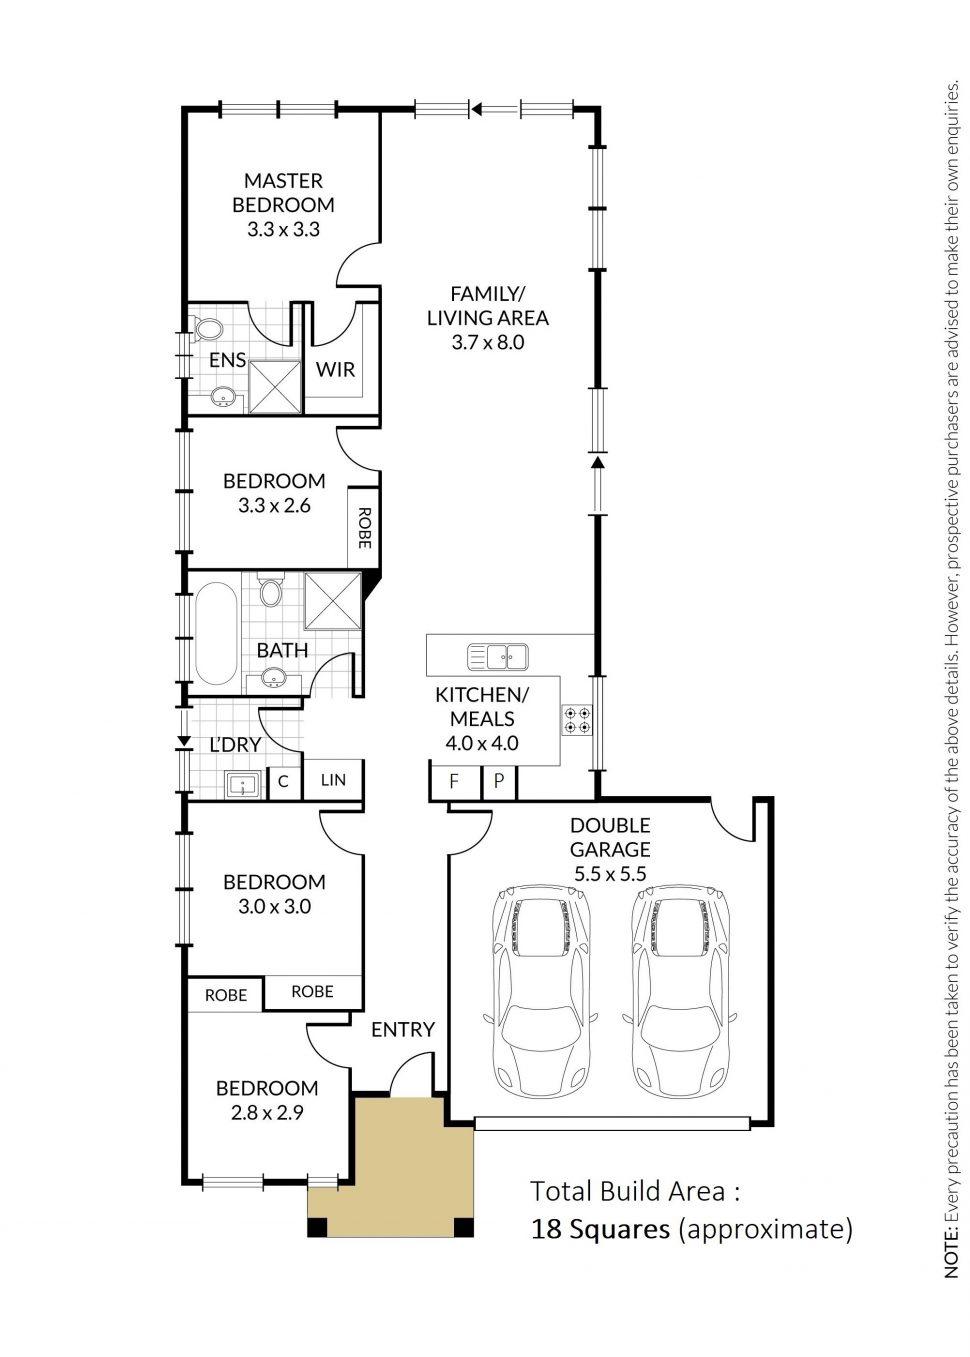 32281414 1623802917 16664 105 Isabella Way Tarneit Floor Plan